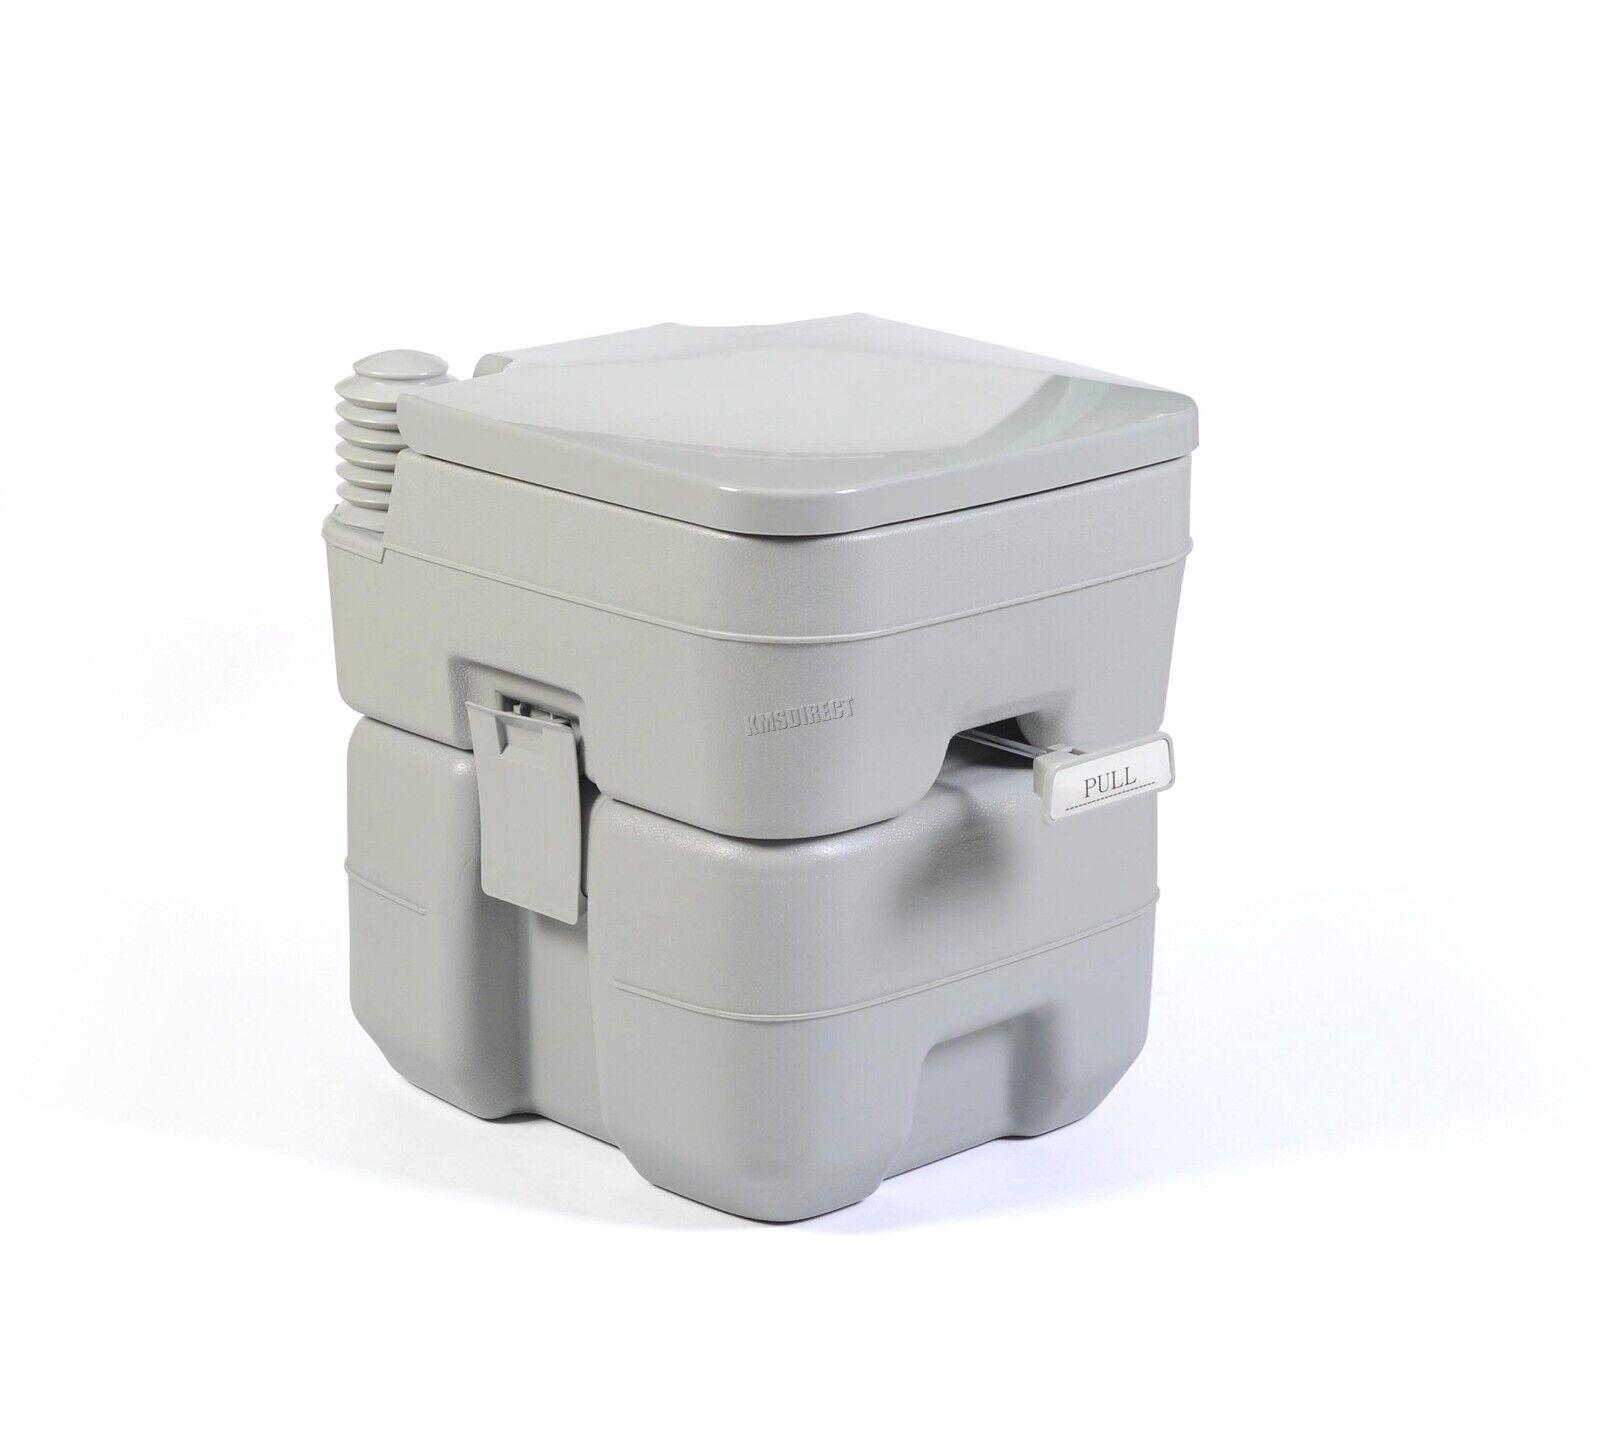 FoxHunter 20L Portable Toilet Flush Caravan Camping Travel WC Loo Porta Potty 3